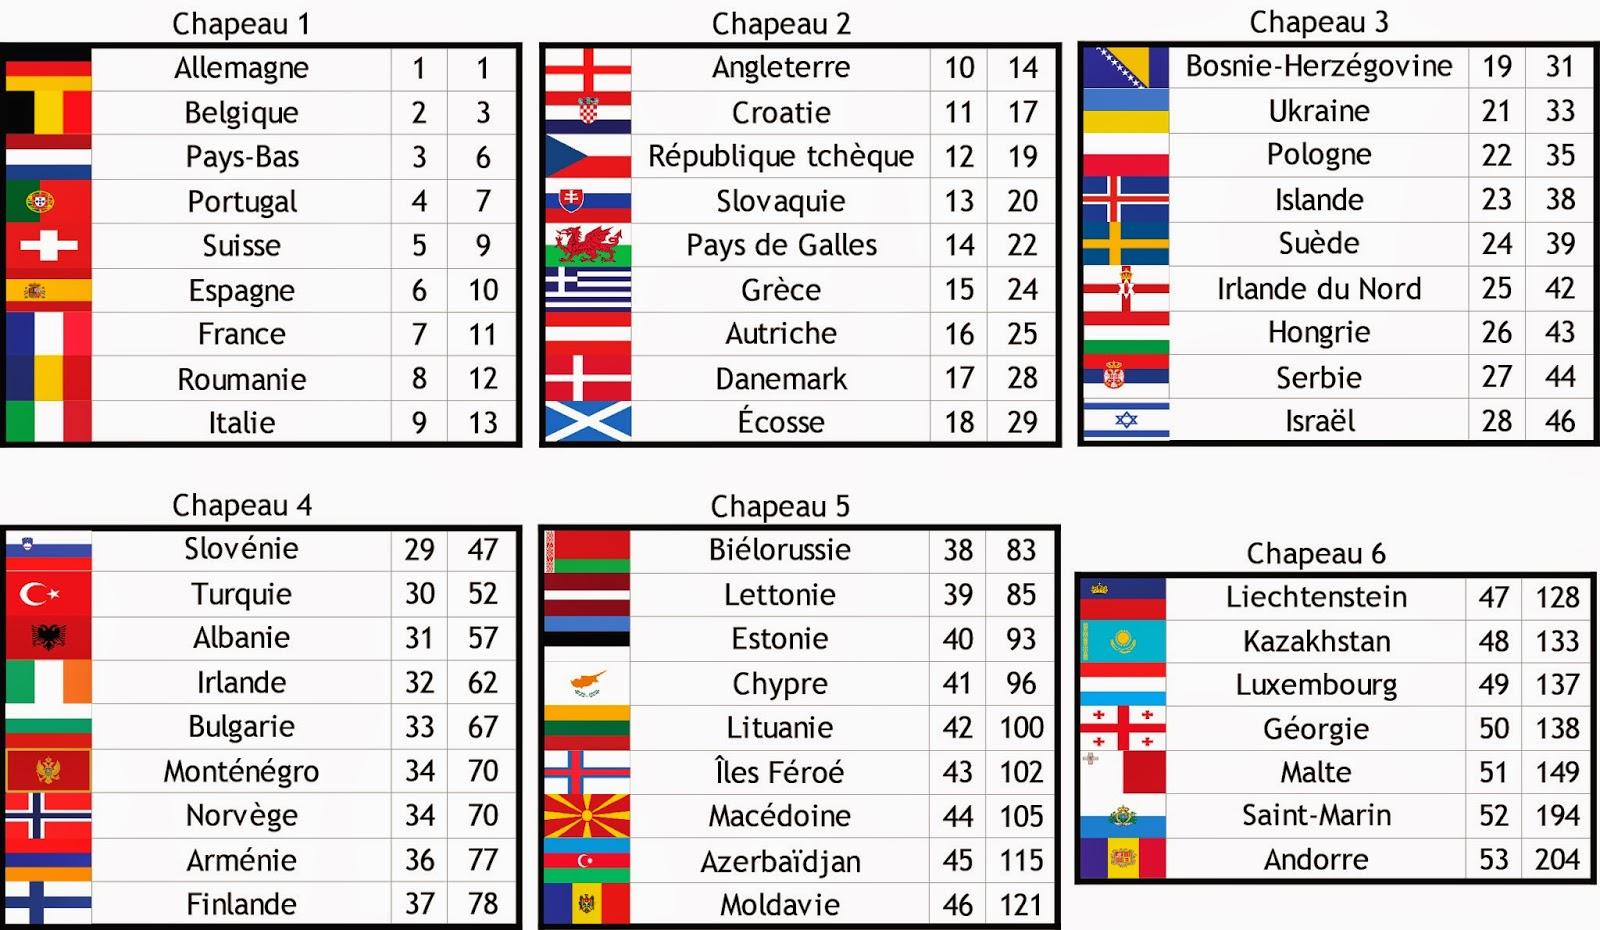 Calendrier 9 septembre 2015 newcalendar - Calendrier eliminatoire coupe du monde ...